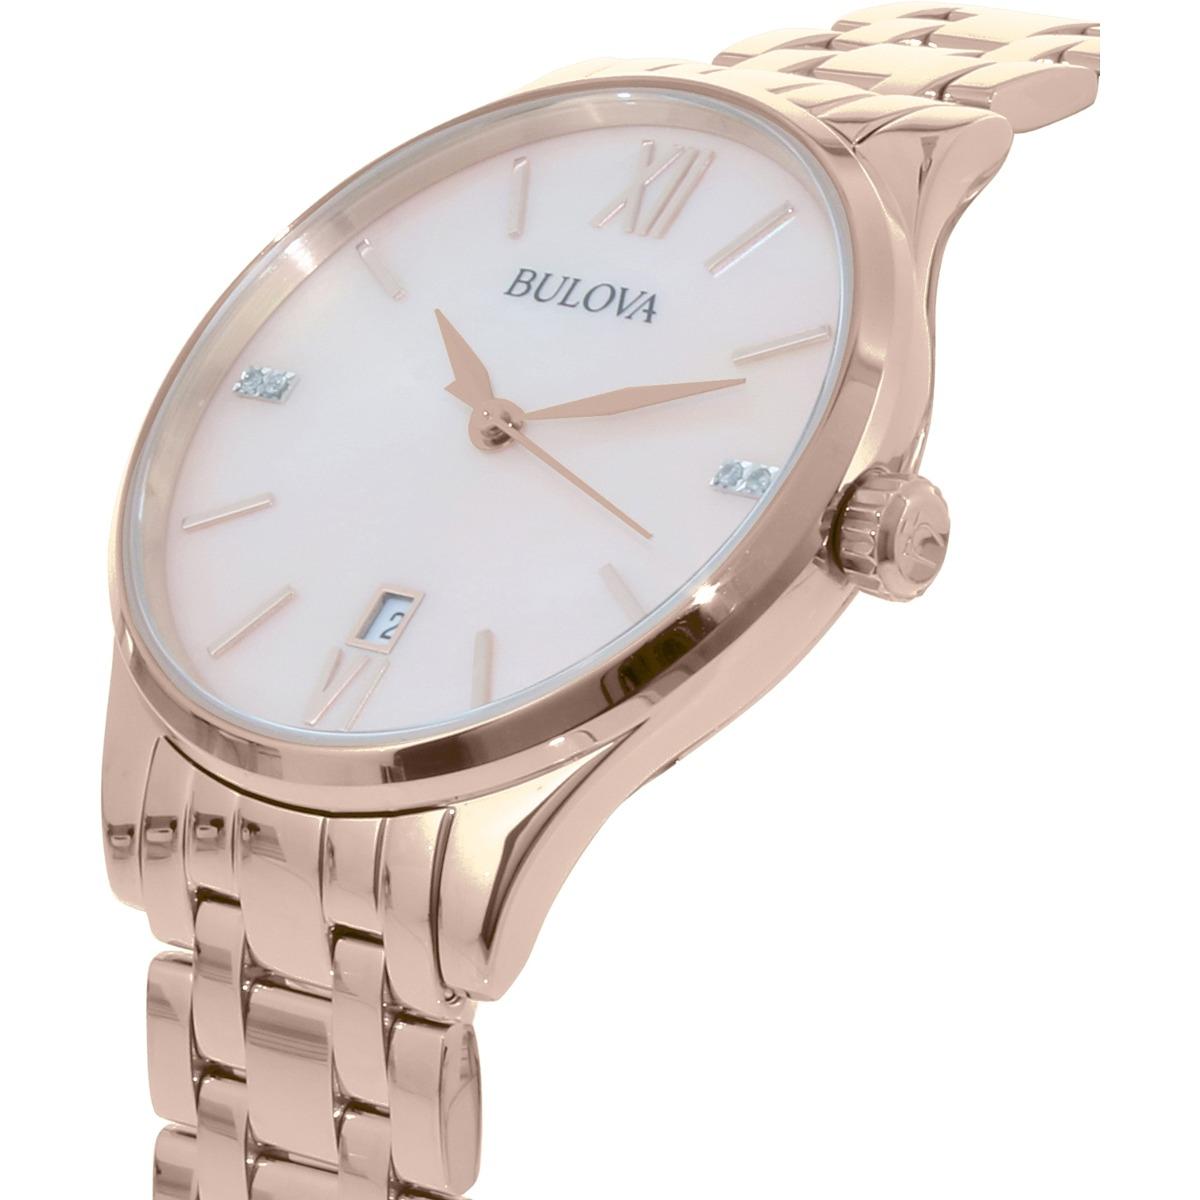 c96f31cf2 Reloj Bulova Para Mujer Oro Rosa Acero Inoxidable Cuarzo -   792.550 ...